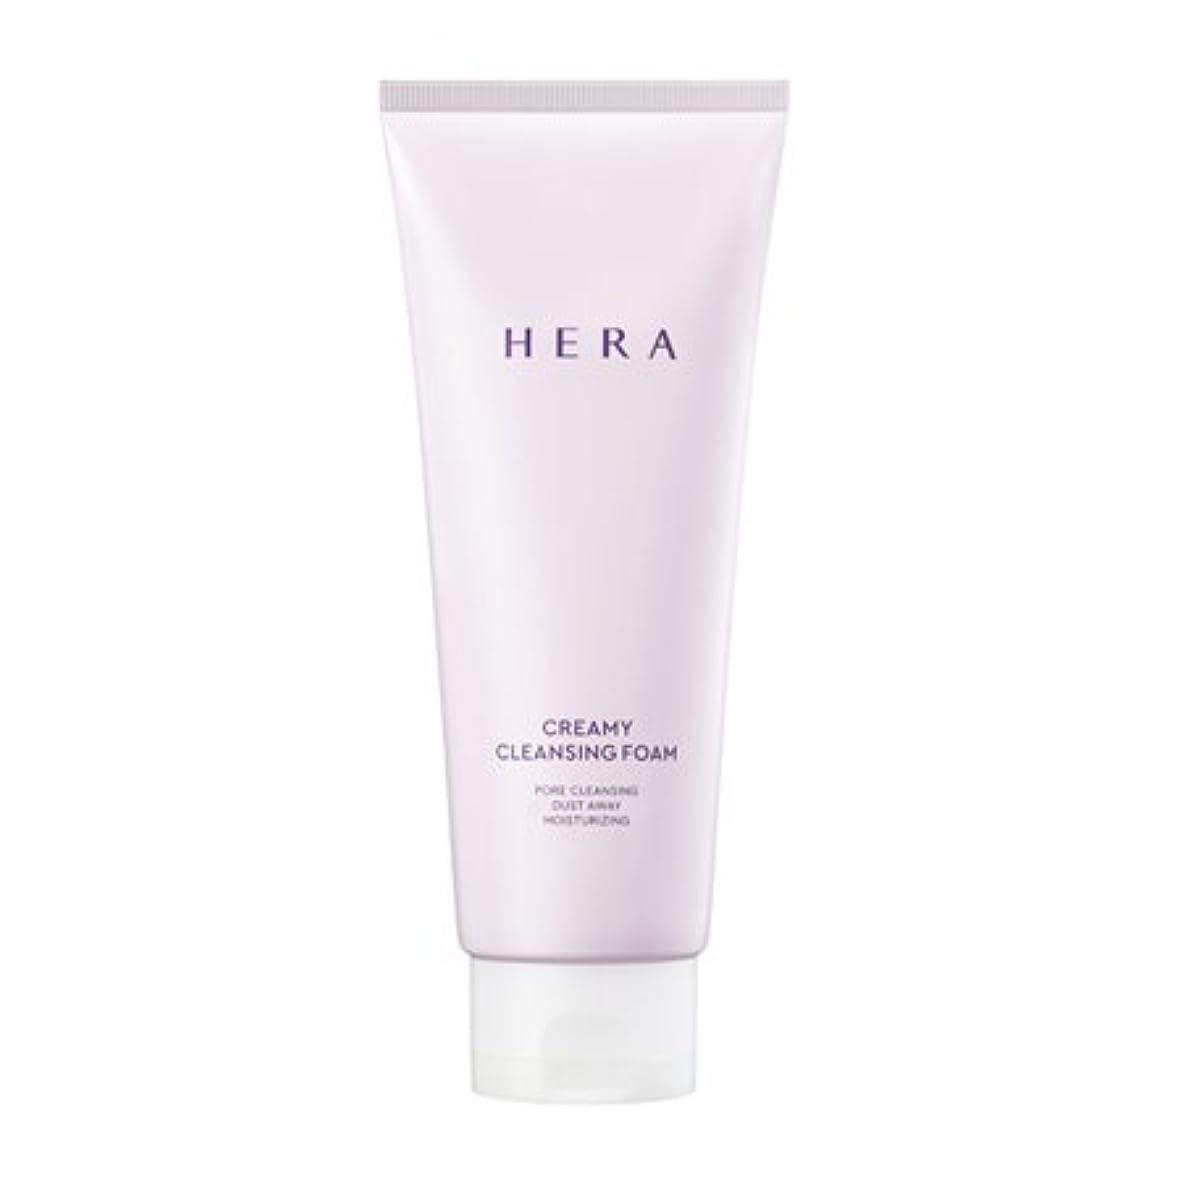 HERA Creamy Cleansing Foam 200ml/ヘラ クリーミー クレンジングフォーム 200ml [並行輸入品]